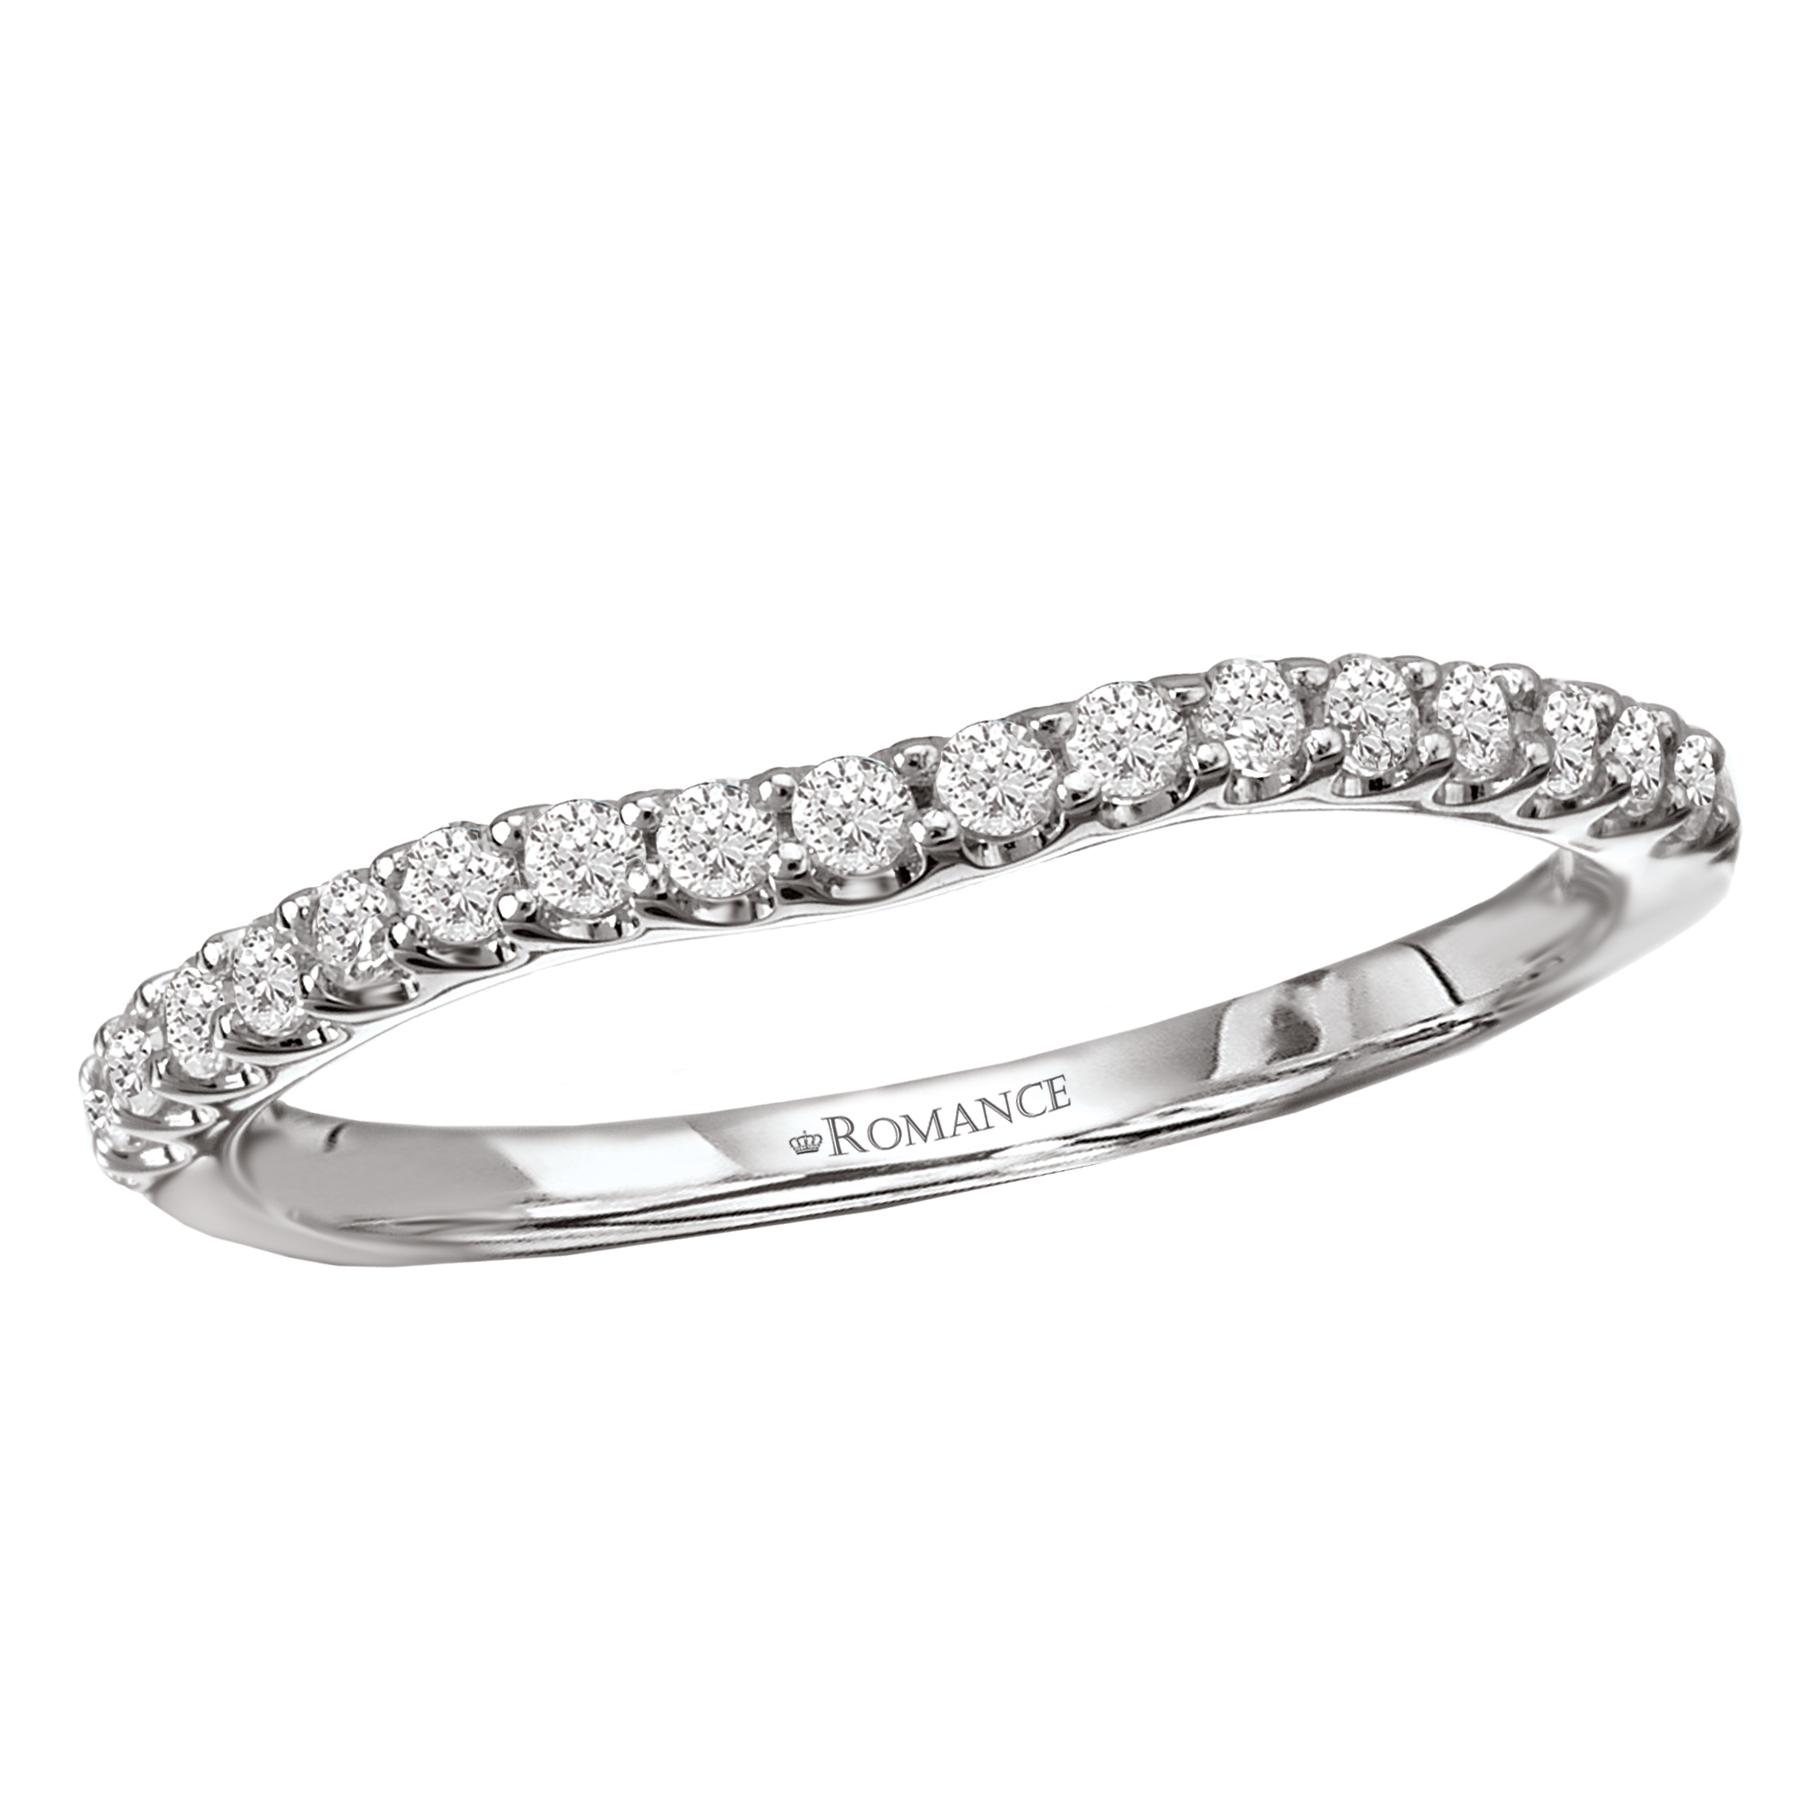 Romance Wedding Bands 117477-W product image